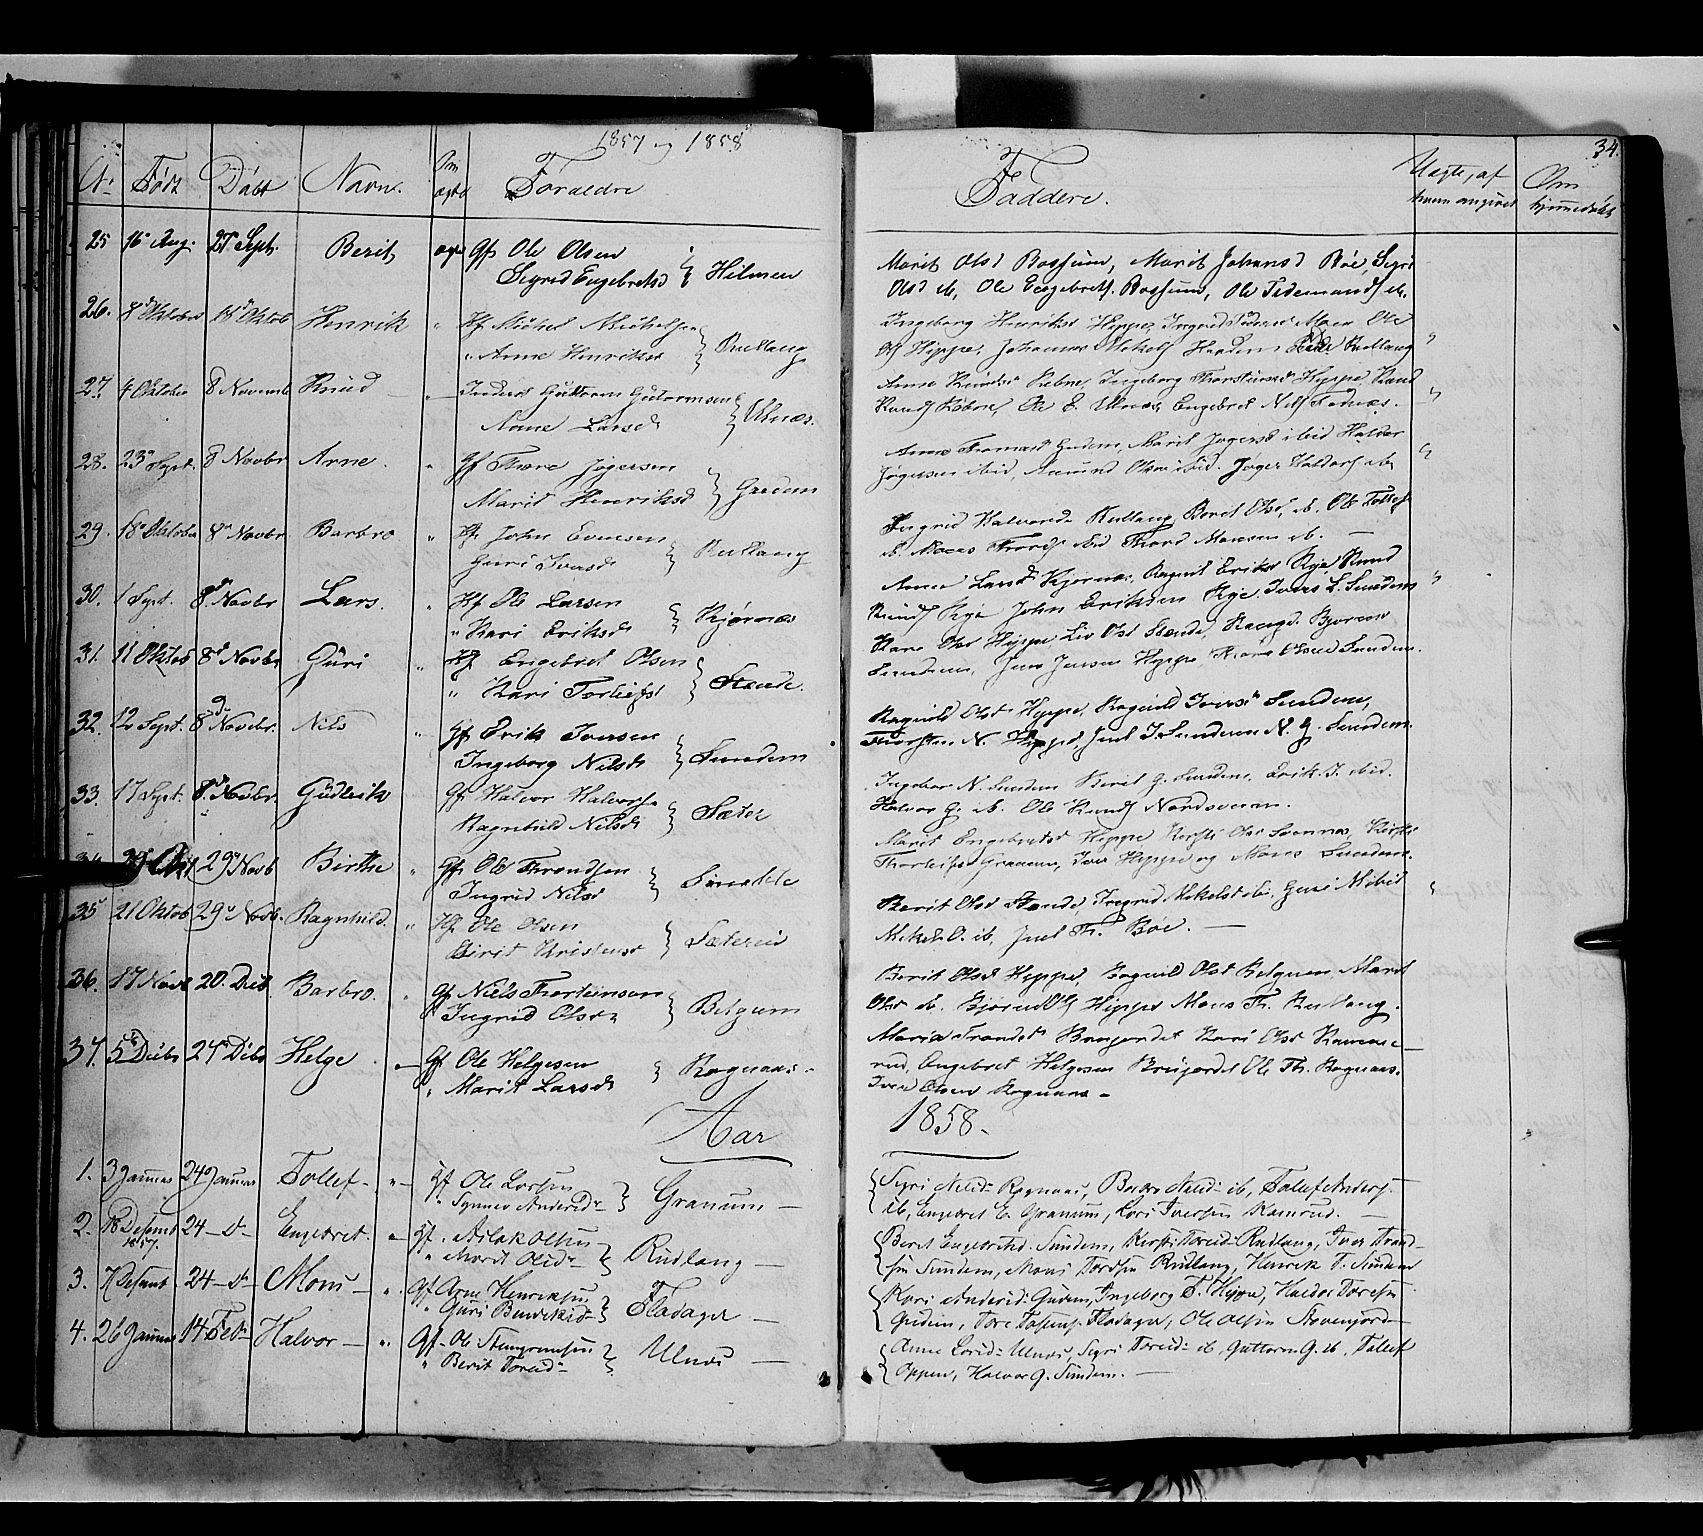 SAH, Nord-Aurdal prestekontor, Ministerialbok nr. 6, 1842-1863, s. 34